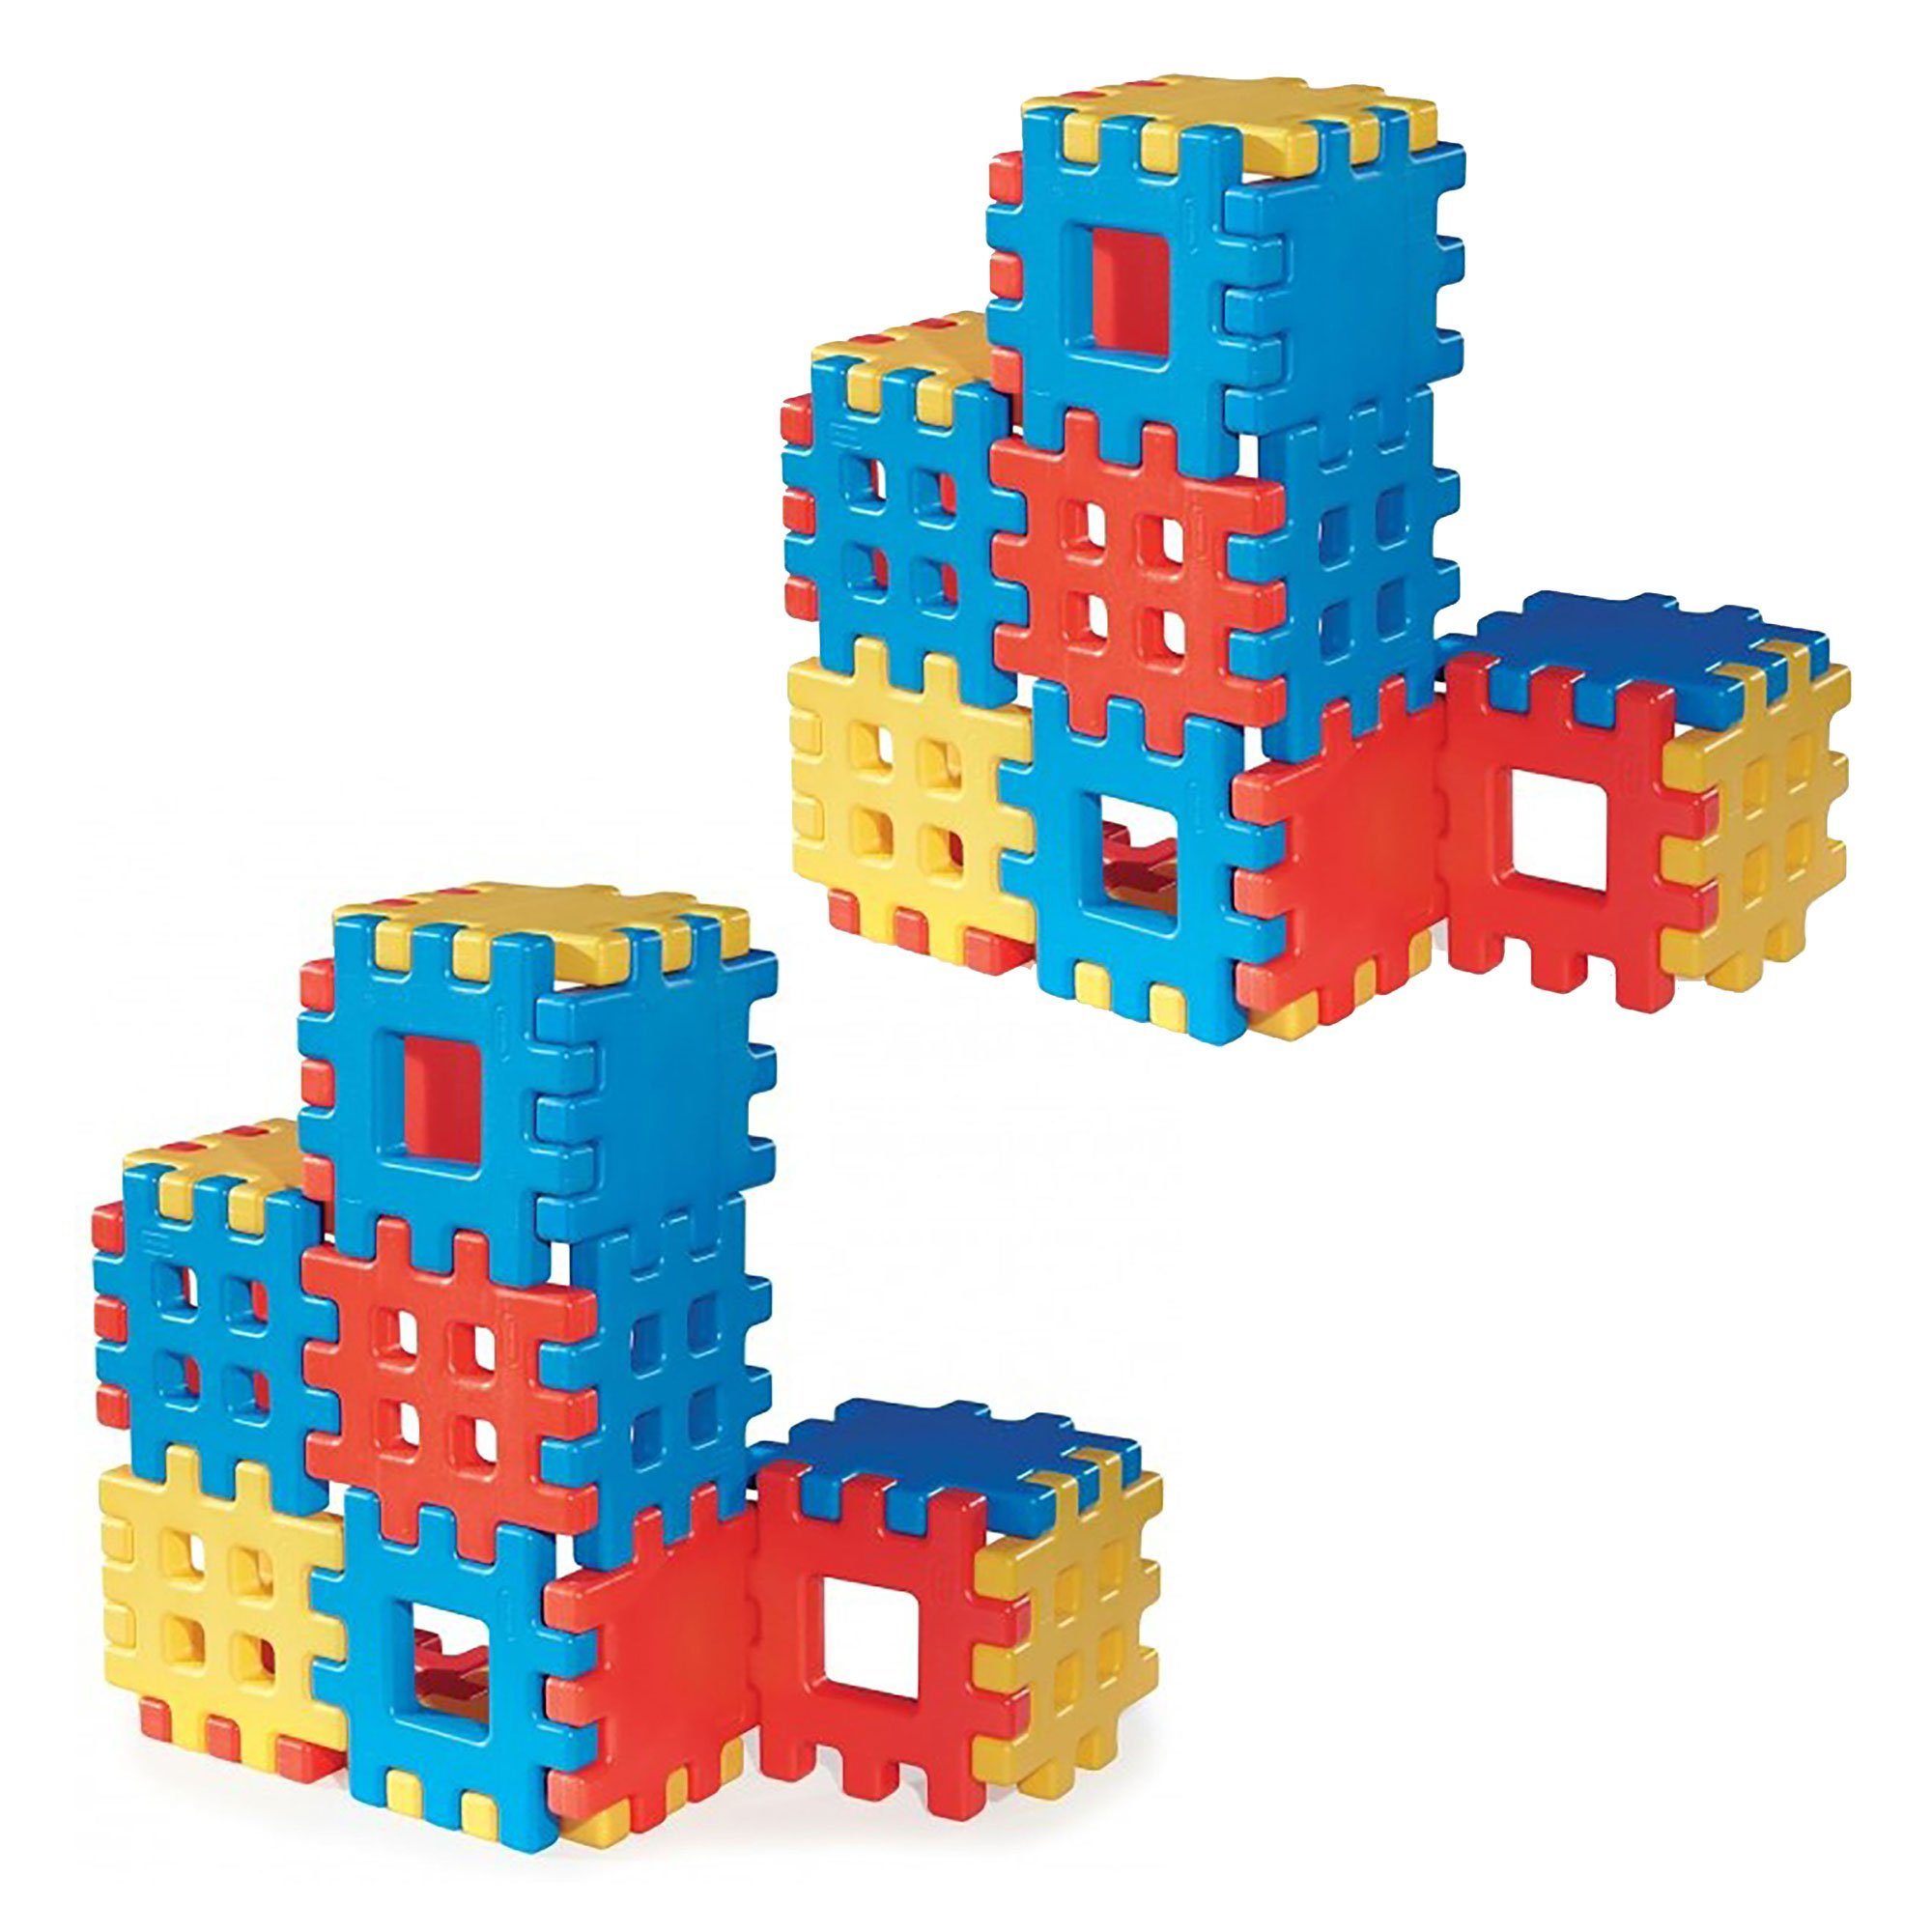 Little Tikes Big Waffle 18 Piece Kids Construction Building Block Set (2 Pack) by Little Tikes